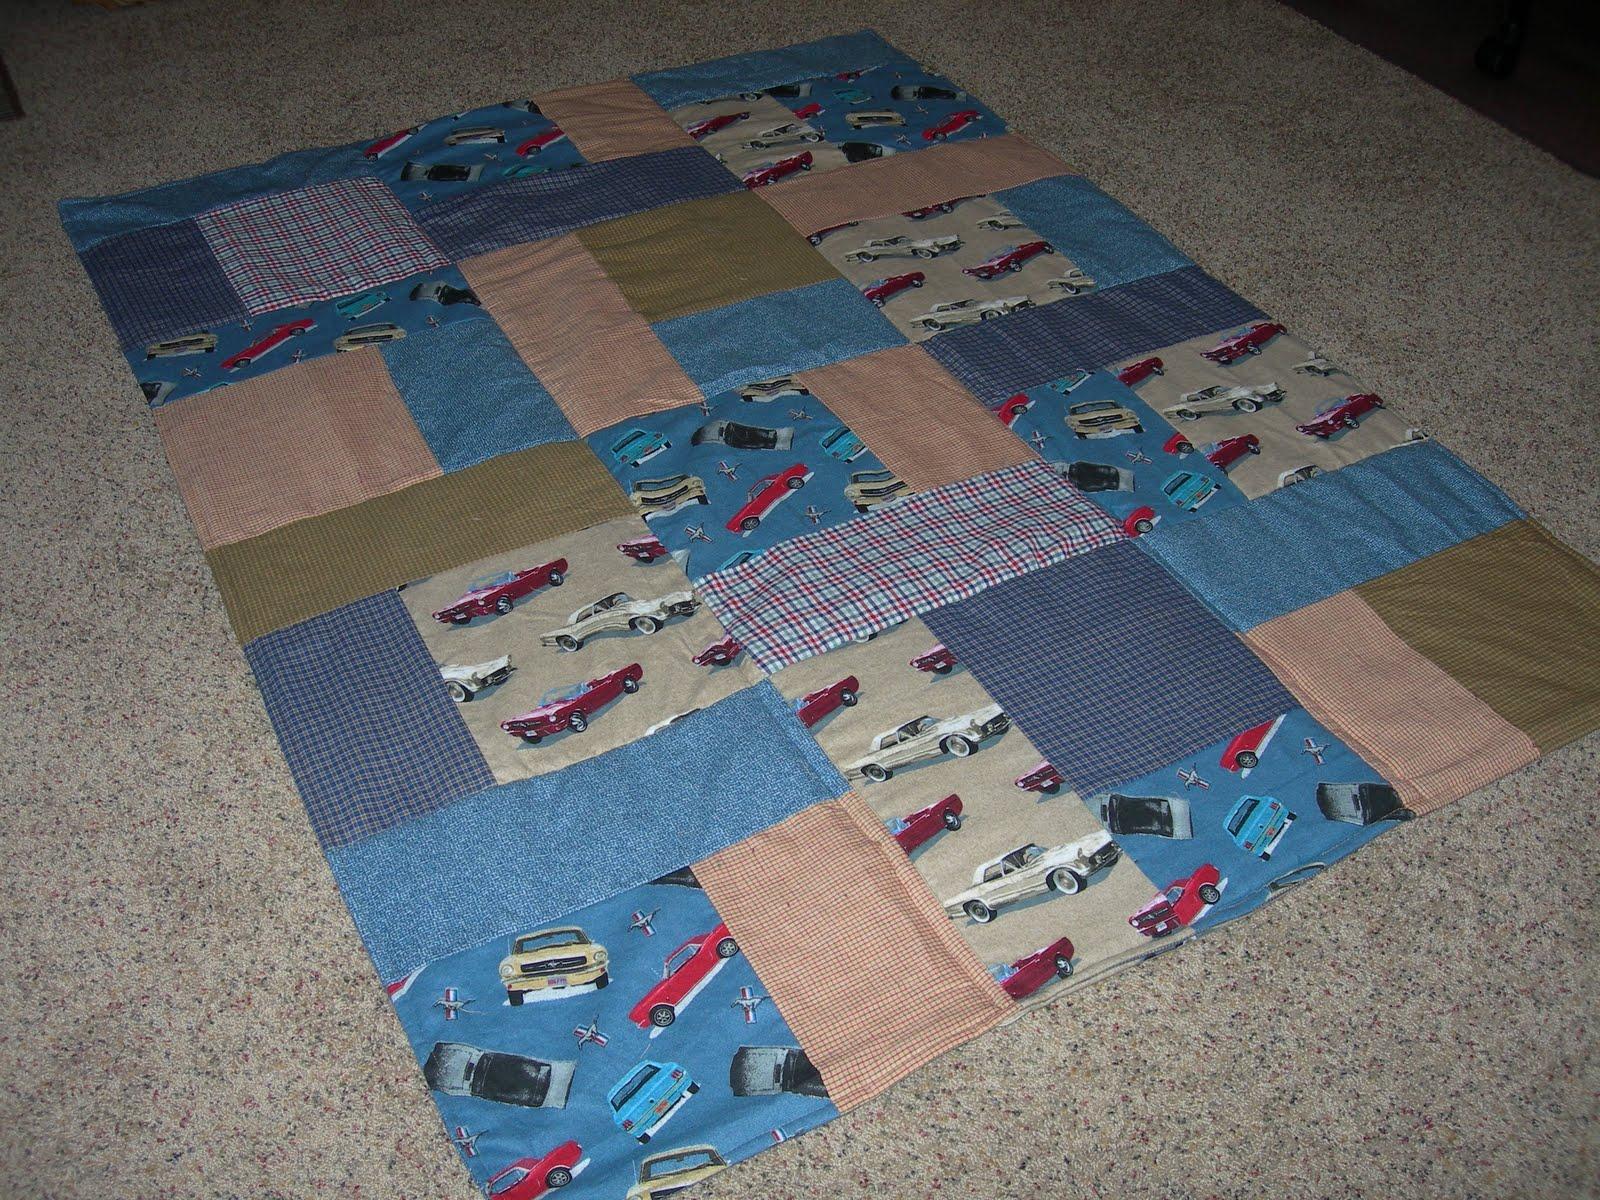 Free quilt patterns updated 2013